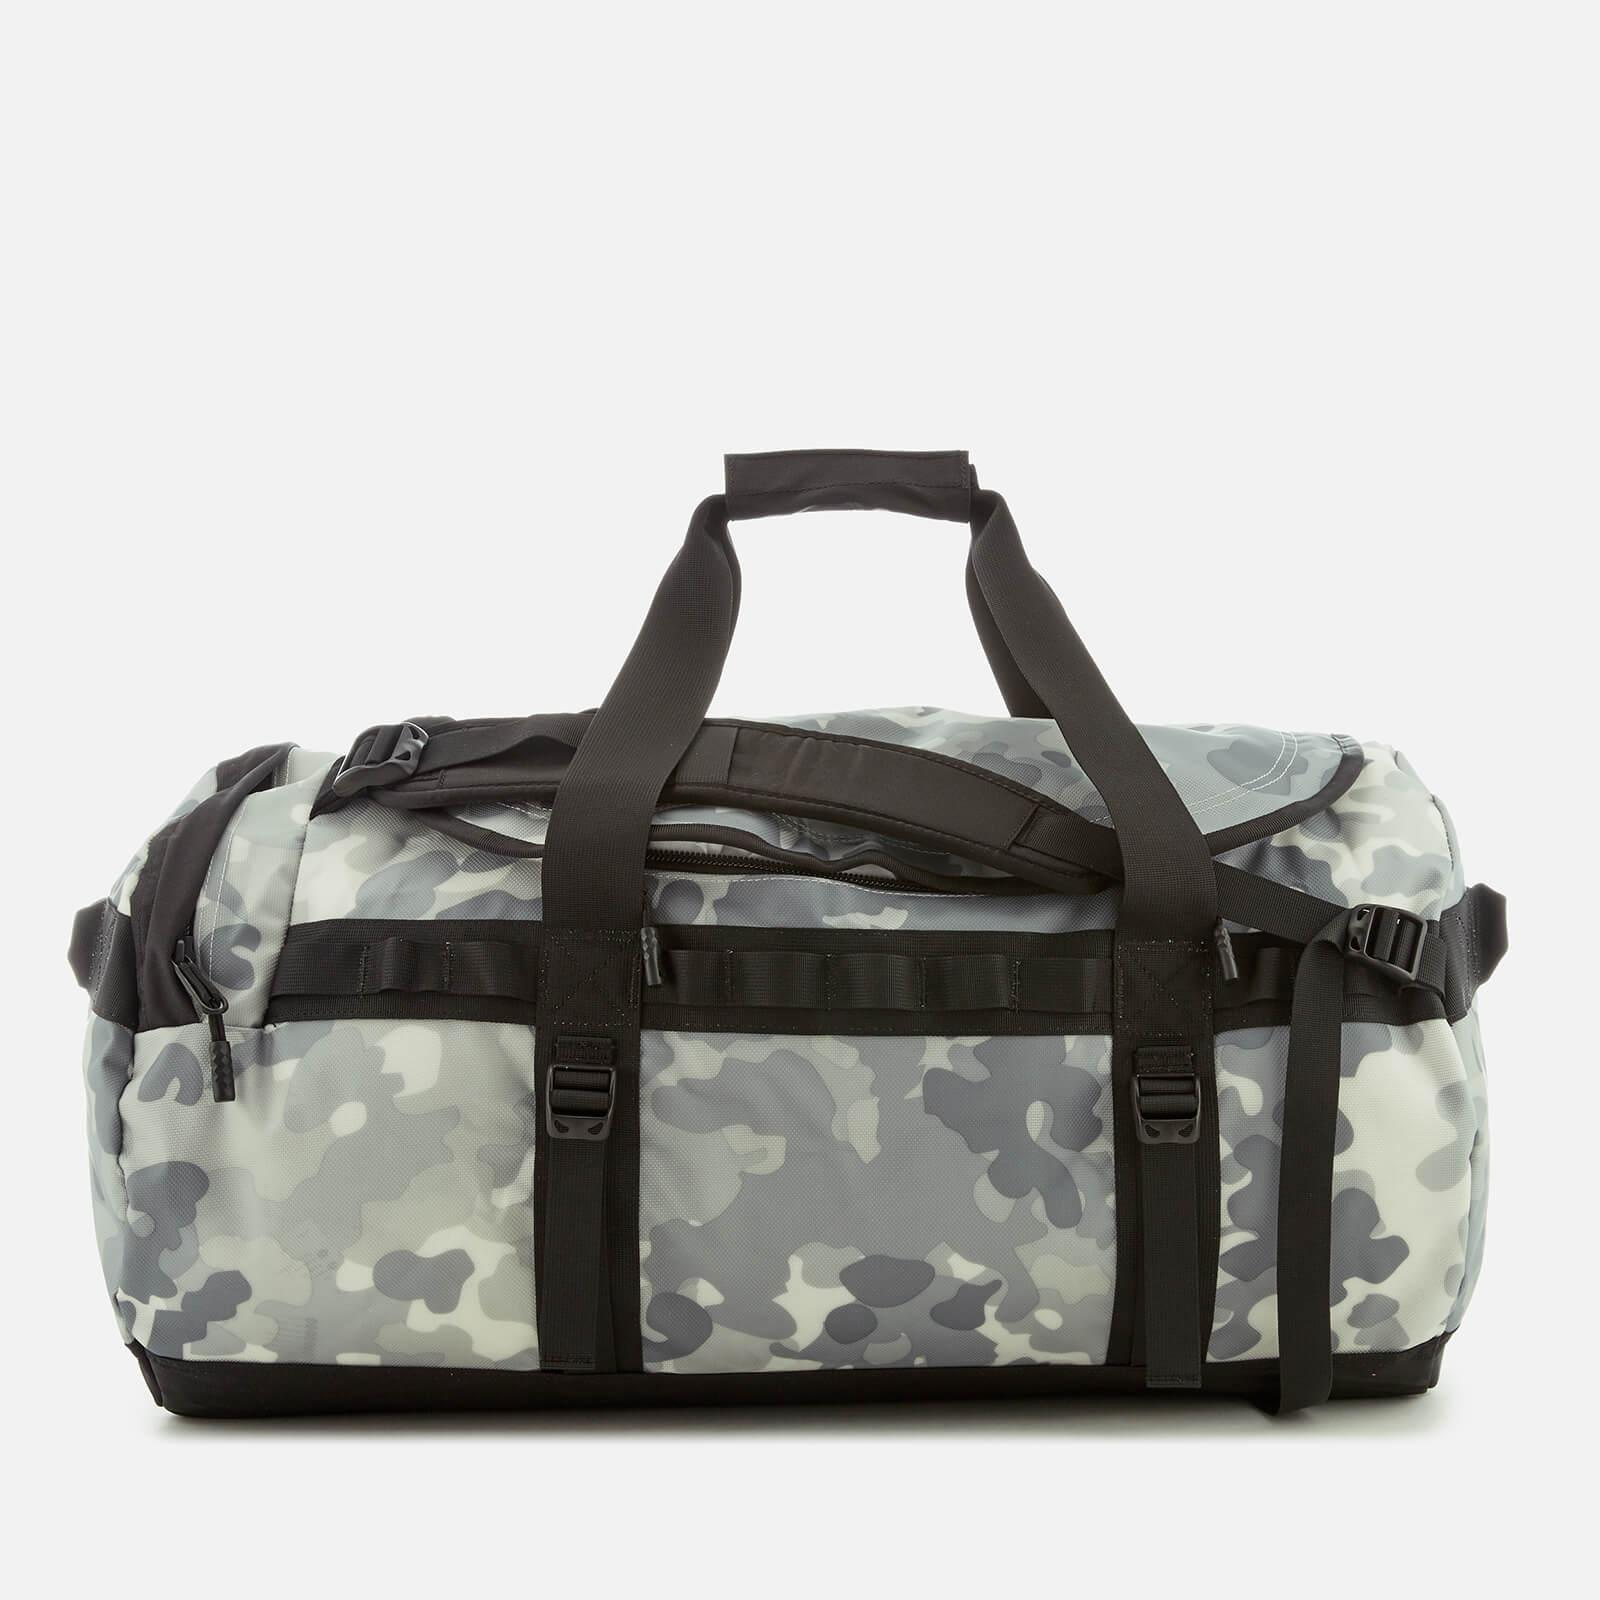 9eca7f6f4f Lyst - The North Face Medium Base Camp Duffel Bag for Men